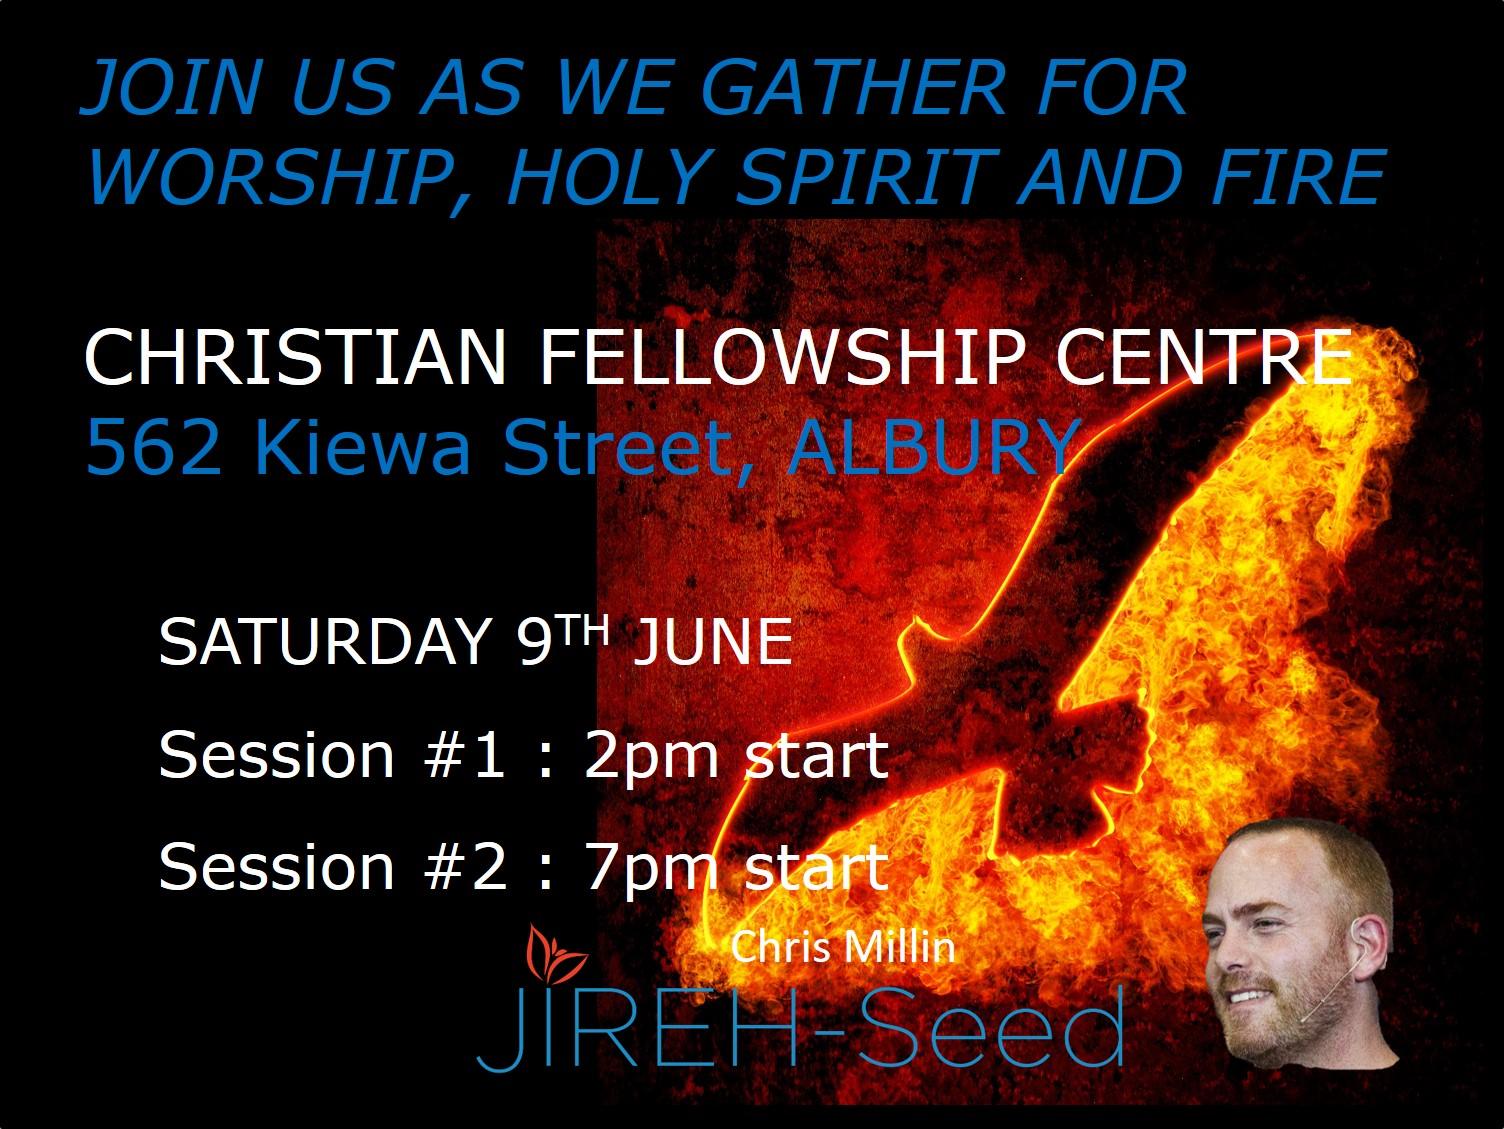 Christian Fellowship Centre Albury.JPG